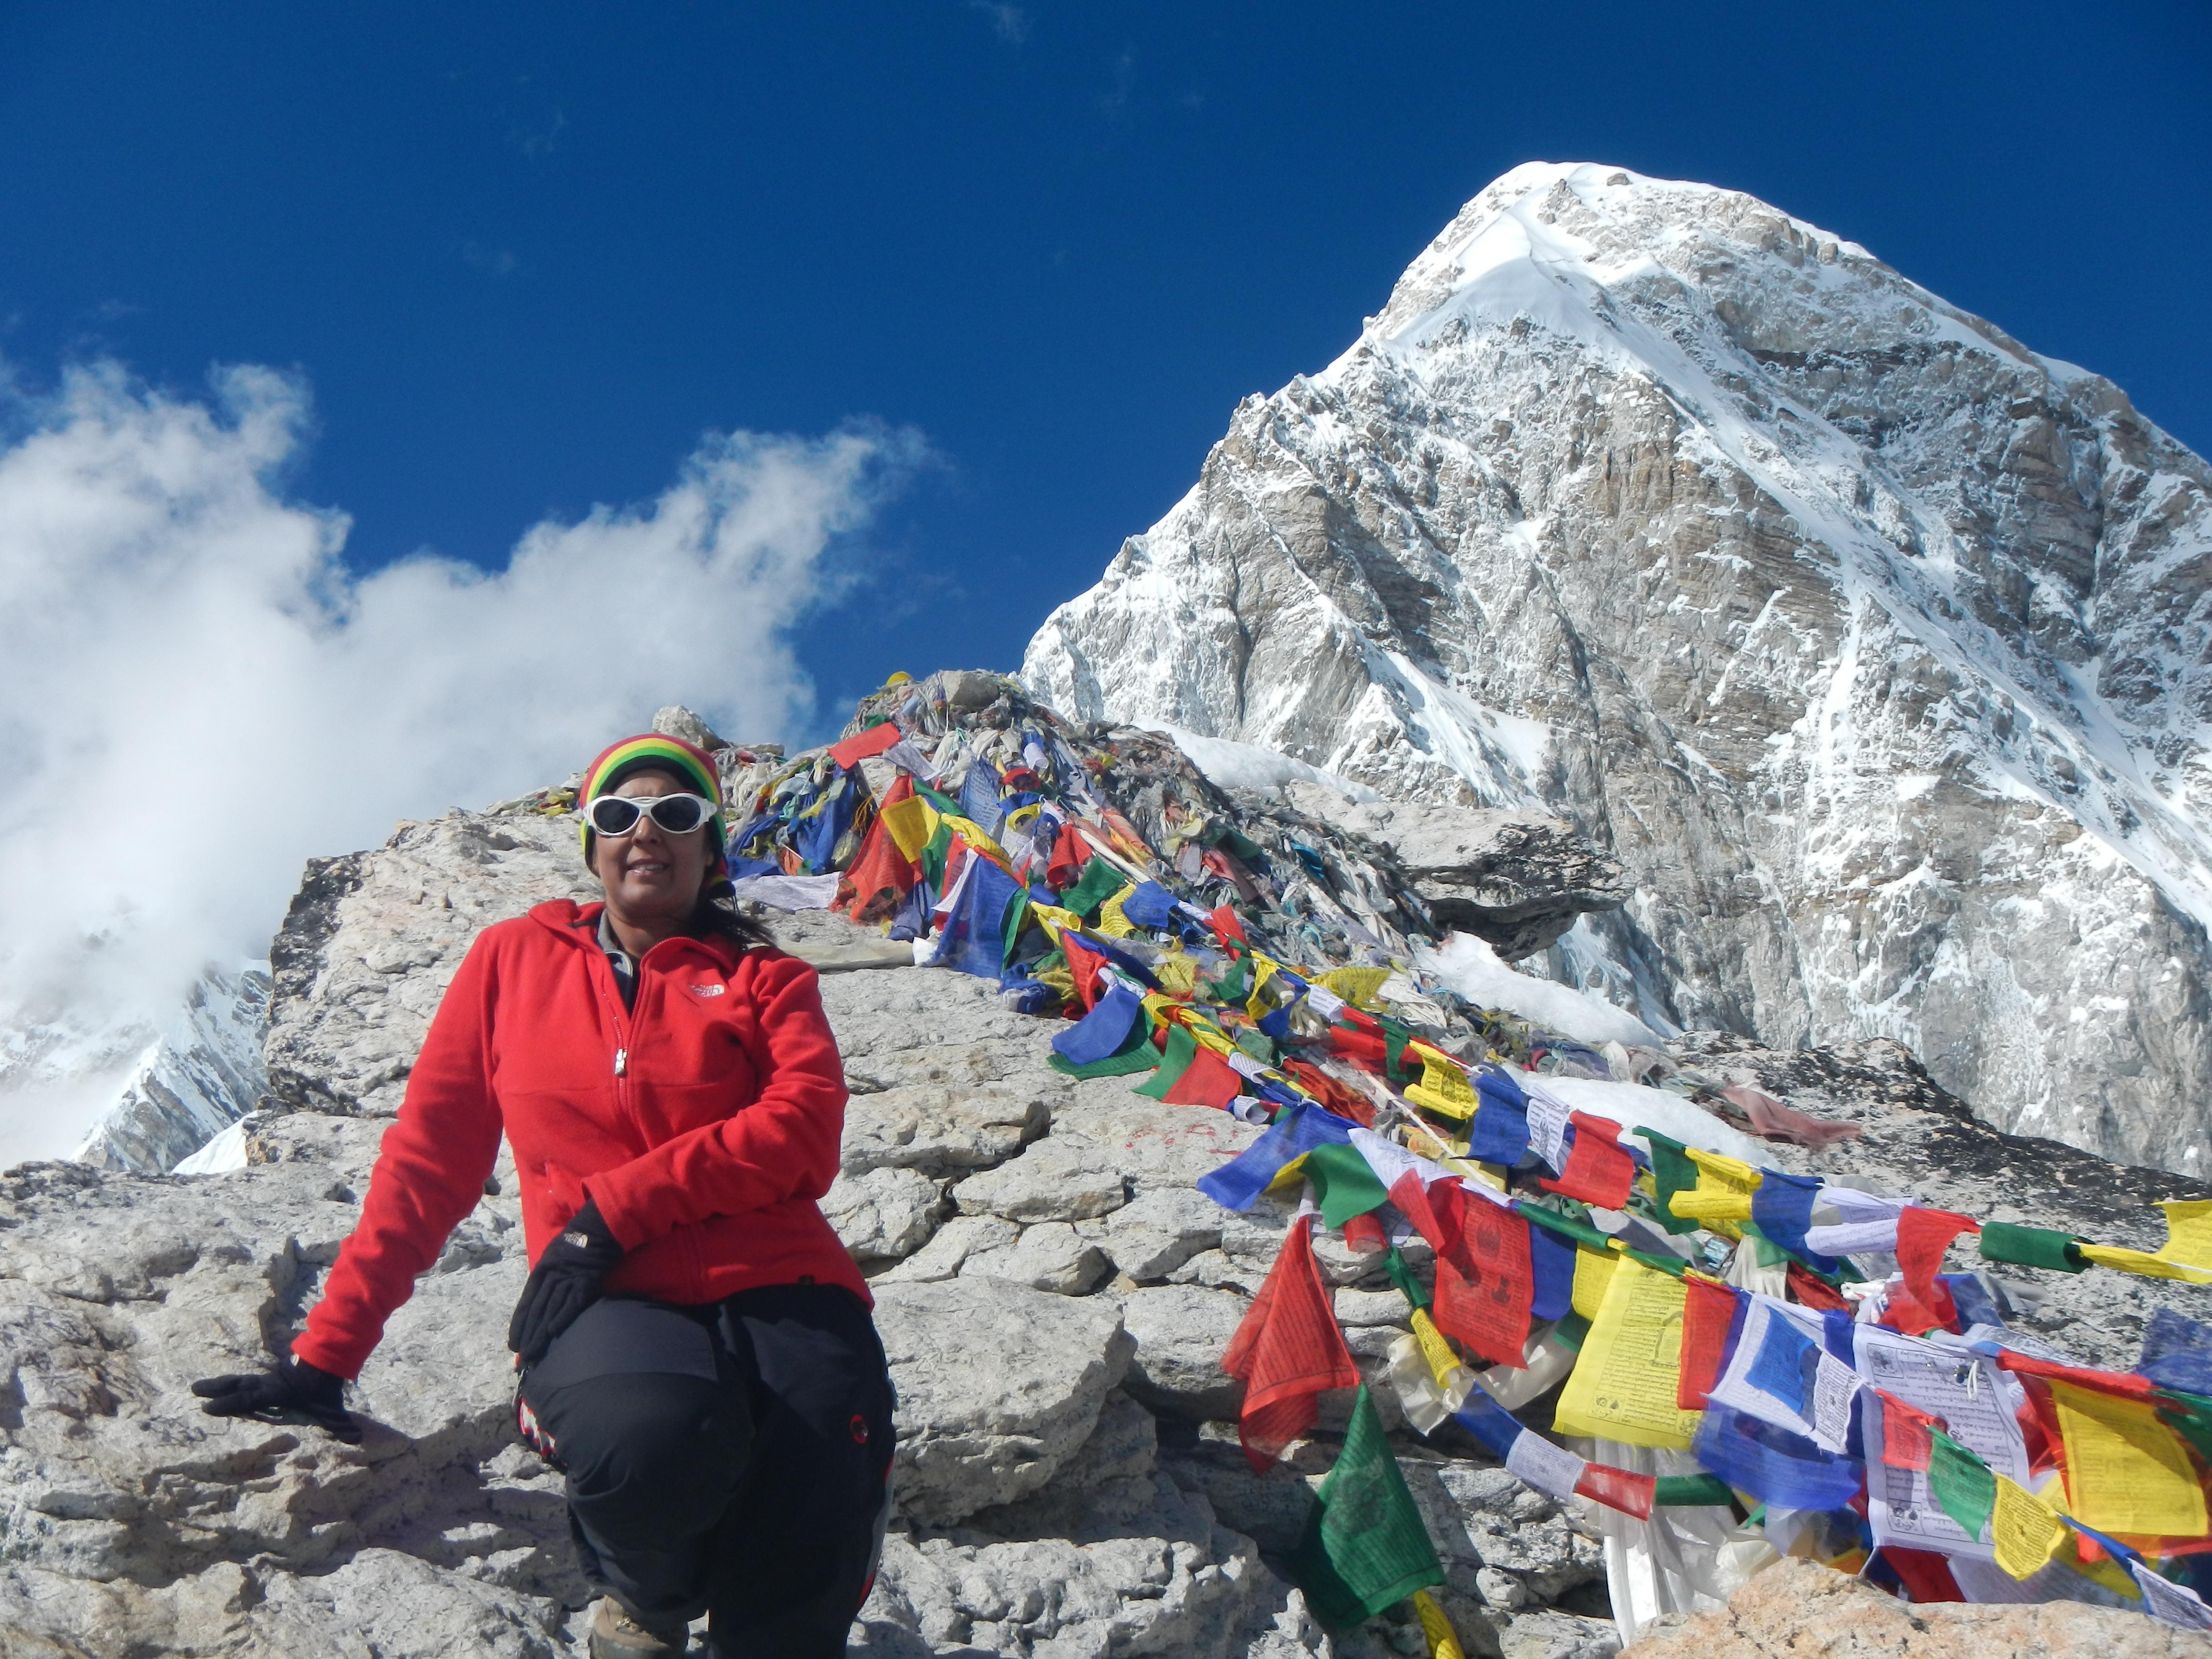 Everest Base Camp (Kala Patthar) 17,600 ft